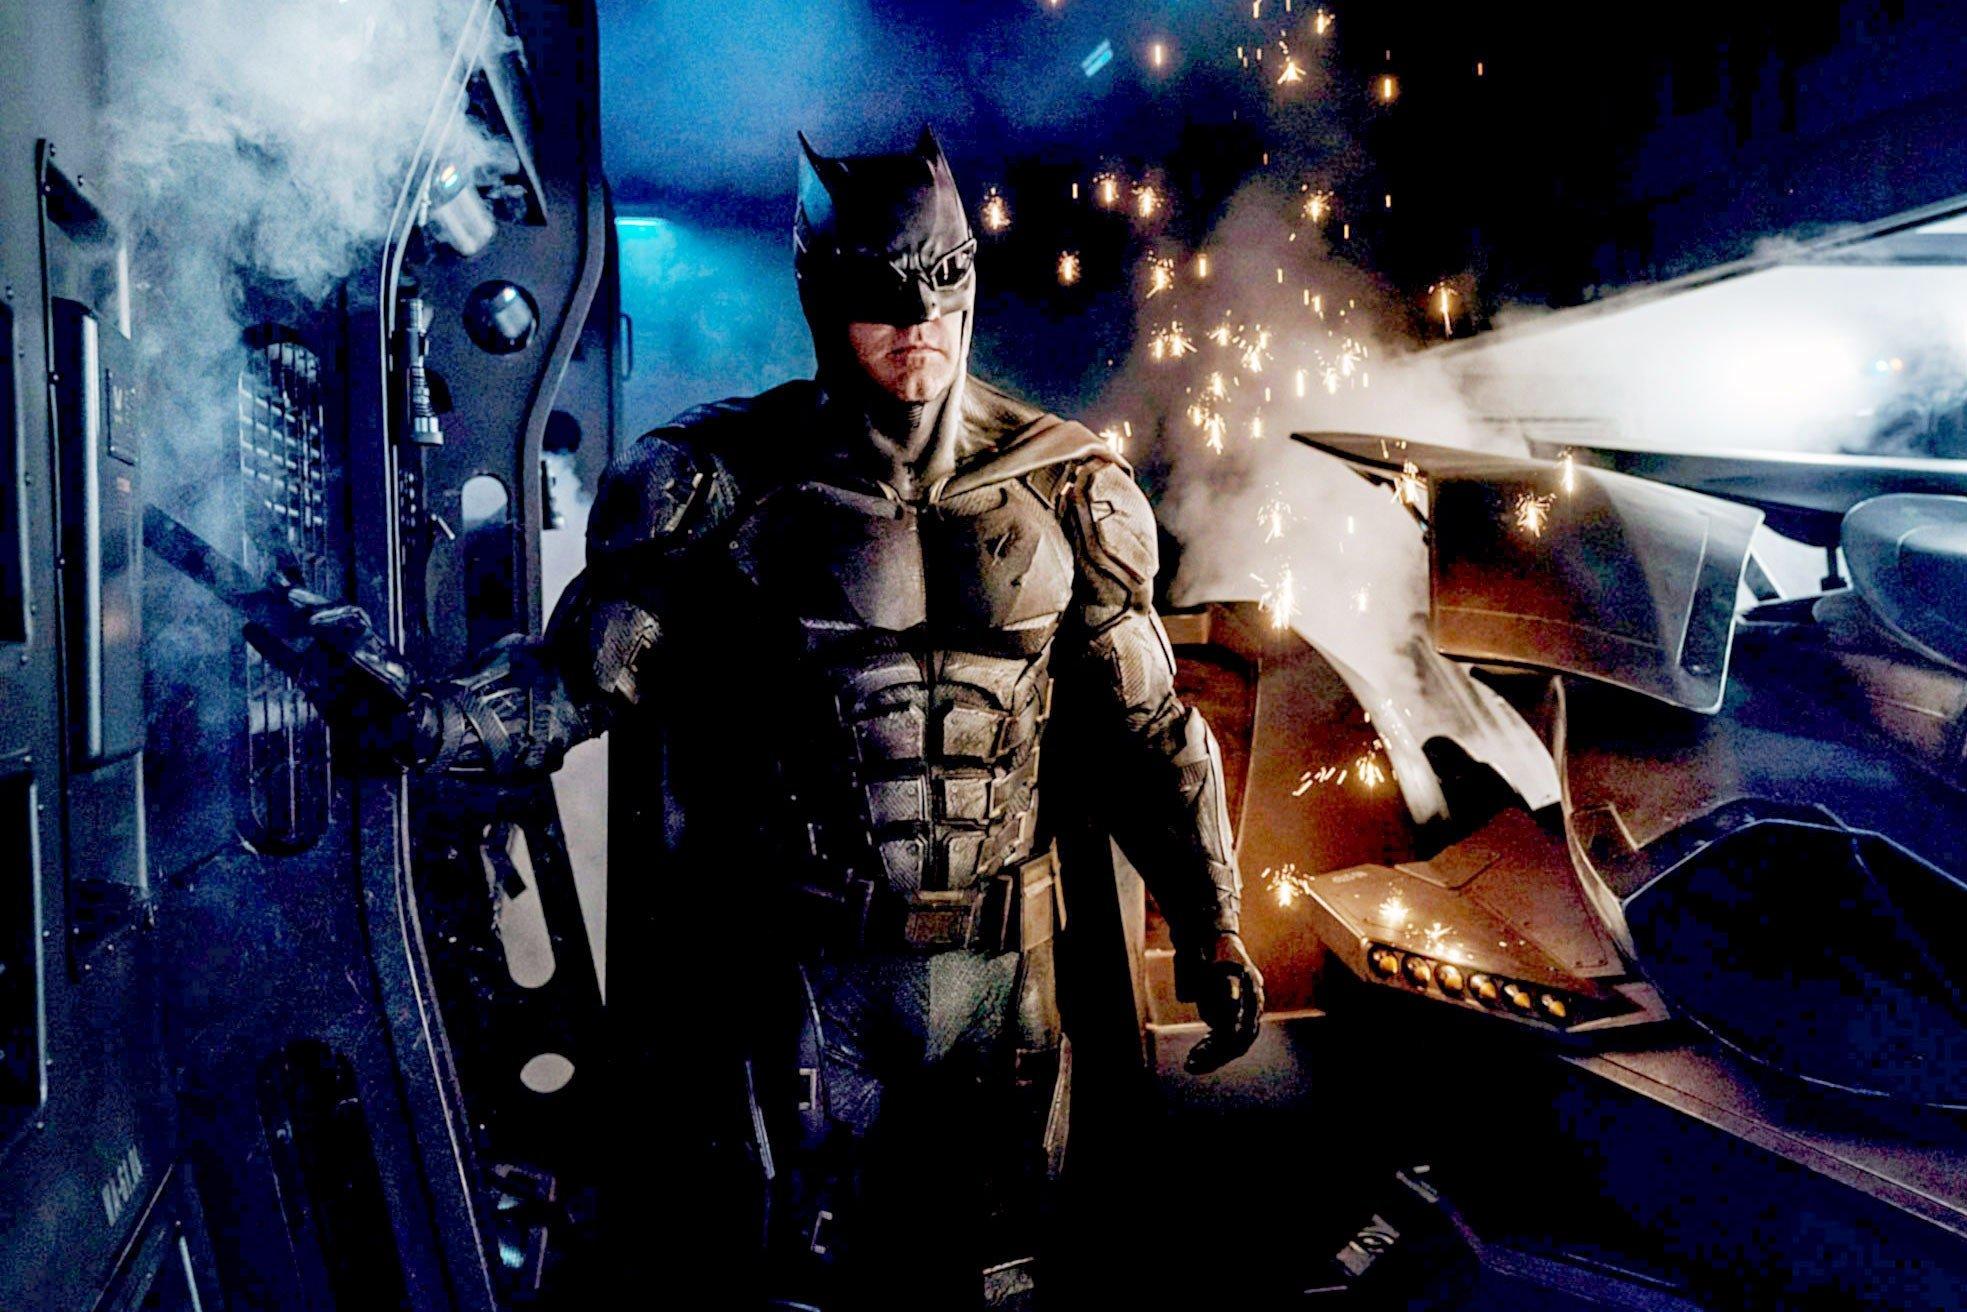 Ben Affleck's Batman To Fight Jared Leto's Joker In HBO Series